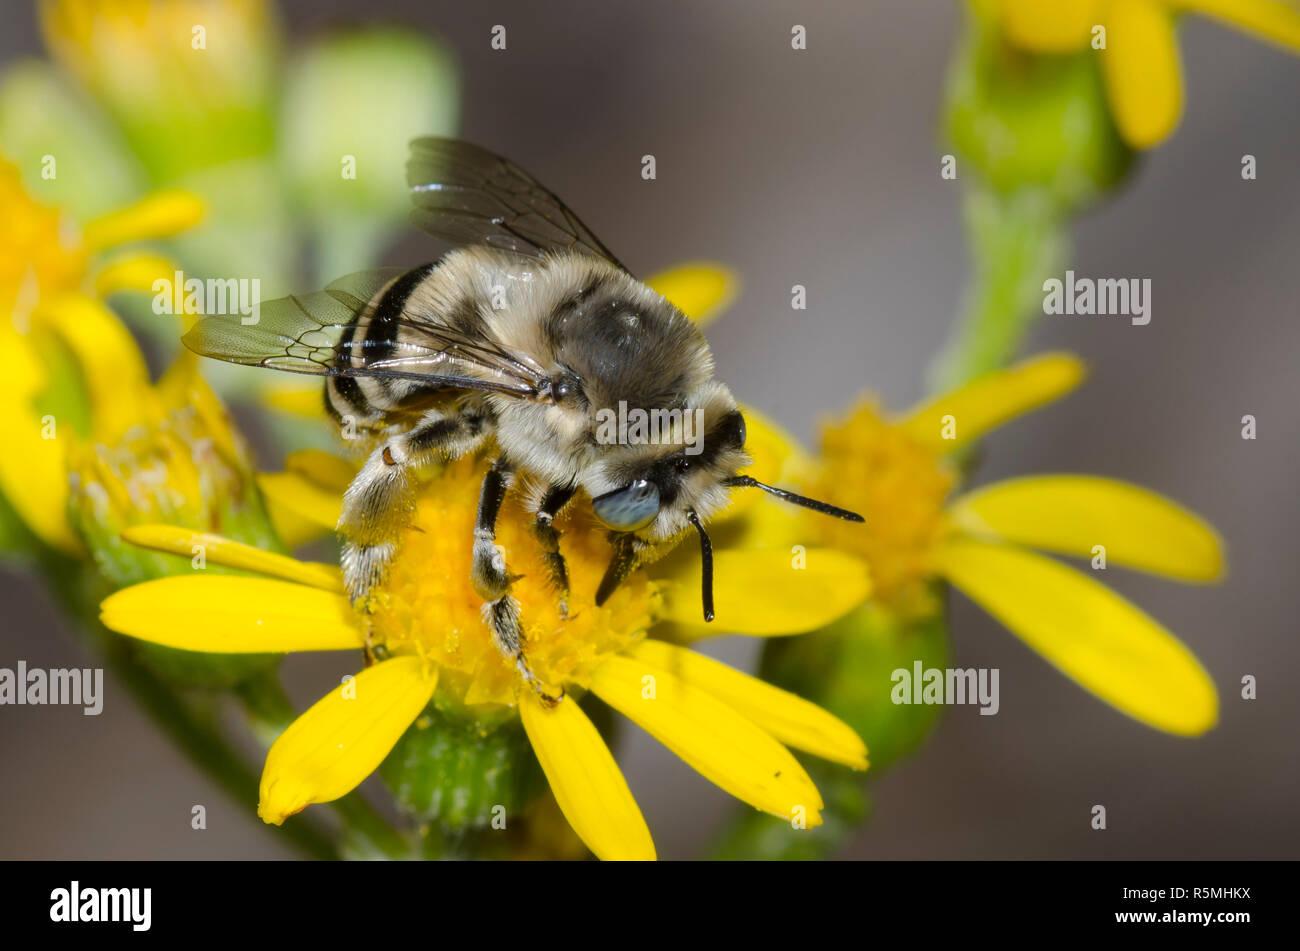 Anthophorine Bee, Anthophora urbana, foraging on yellow composite flower - Stock Image